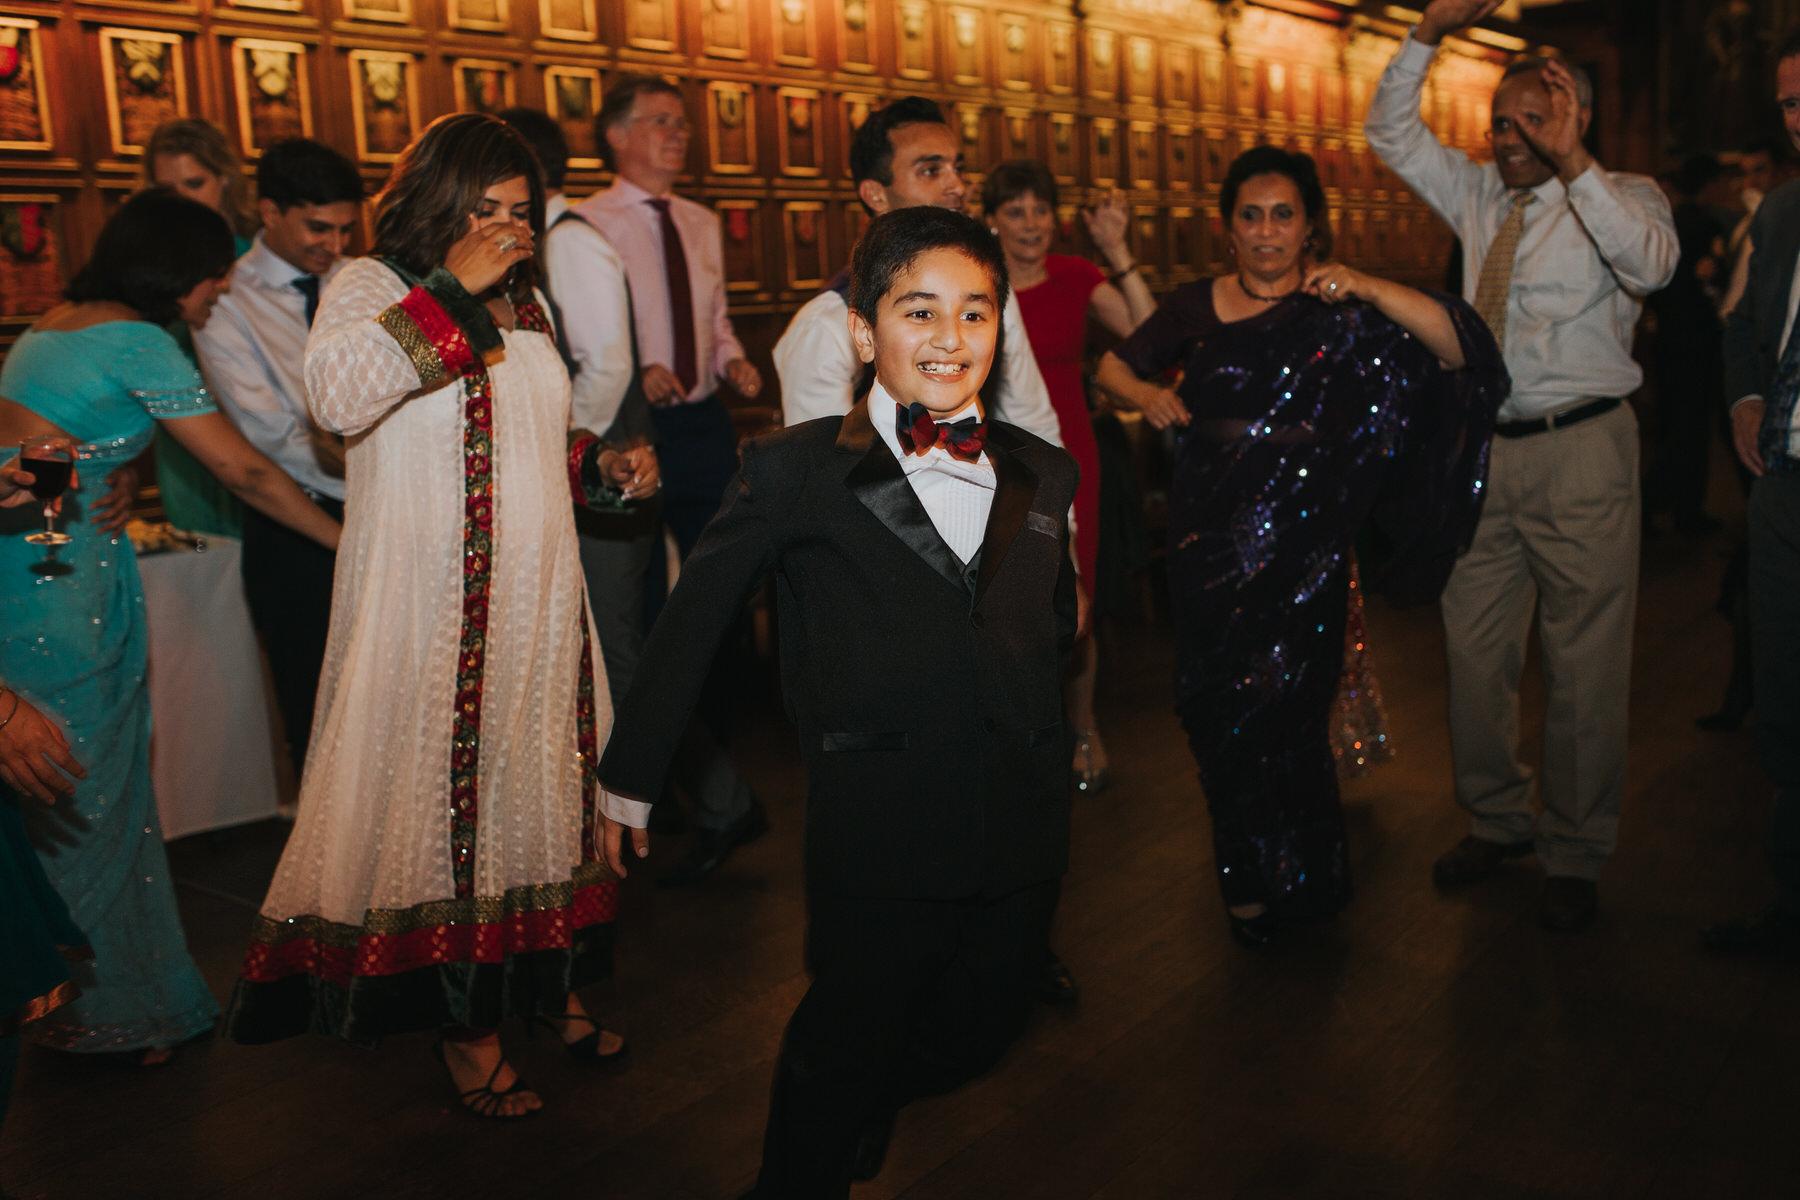 242-Anglo-Asian-Wedding-dancing-guests.jpg